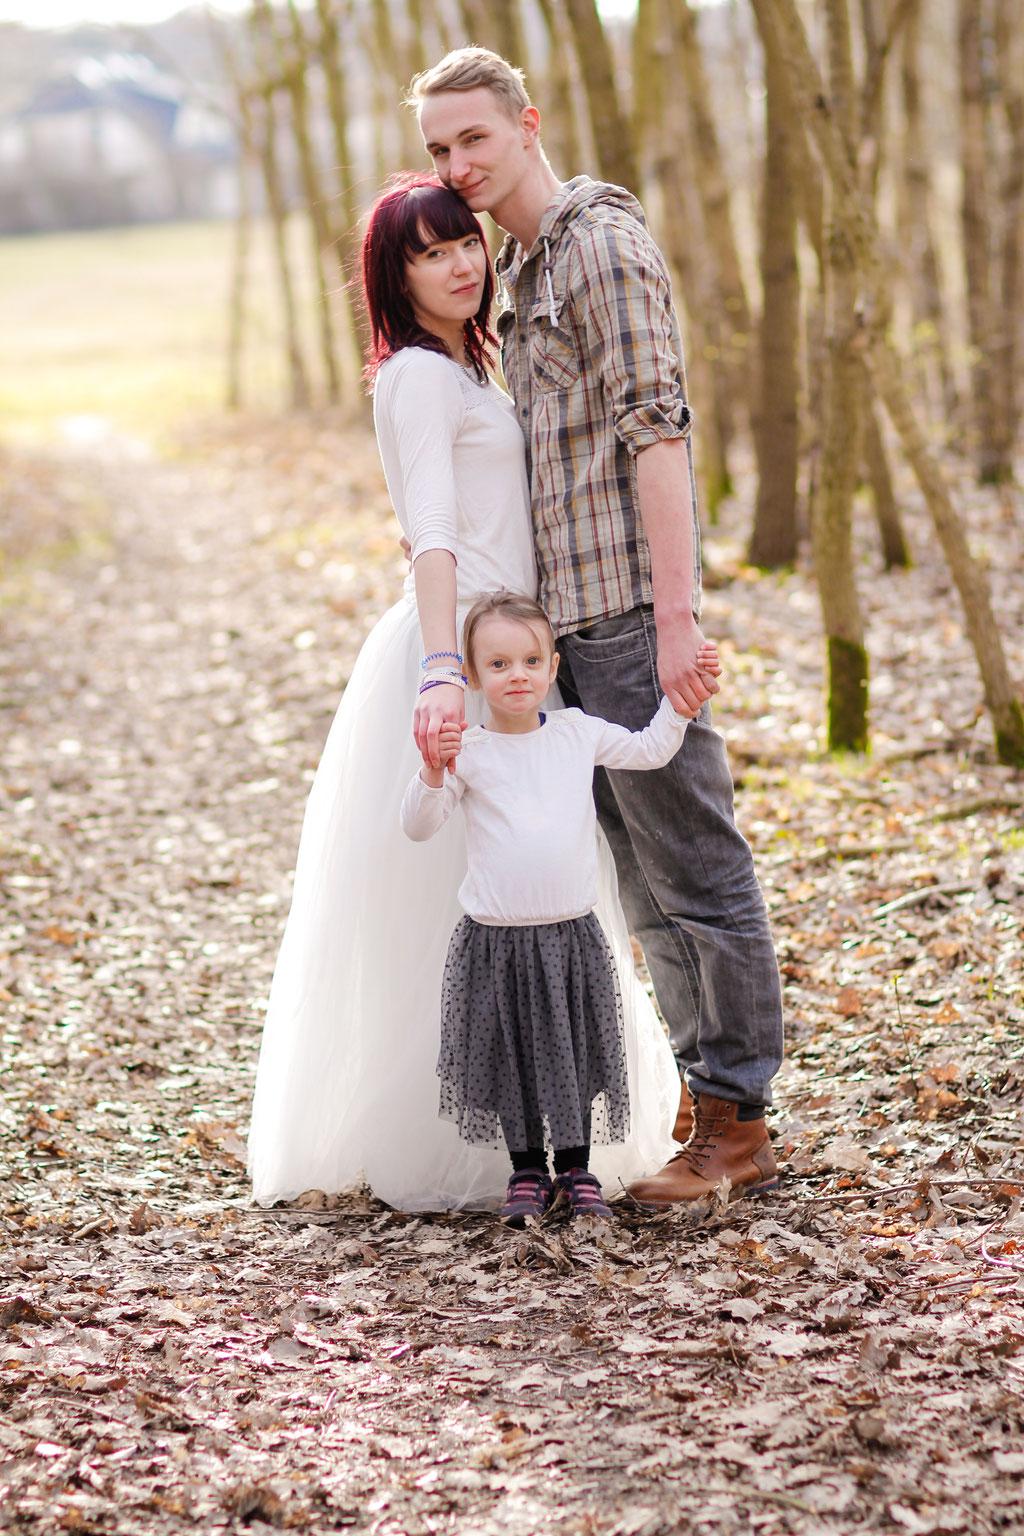 Familien| Tüllrock| Wald| Neubrandenburg| Hendrikje Richert Fotografie